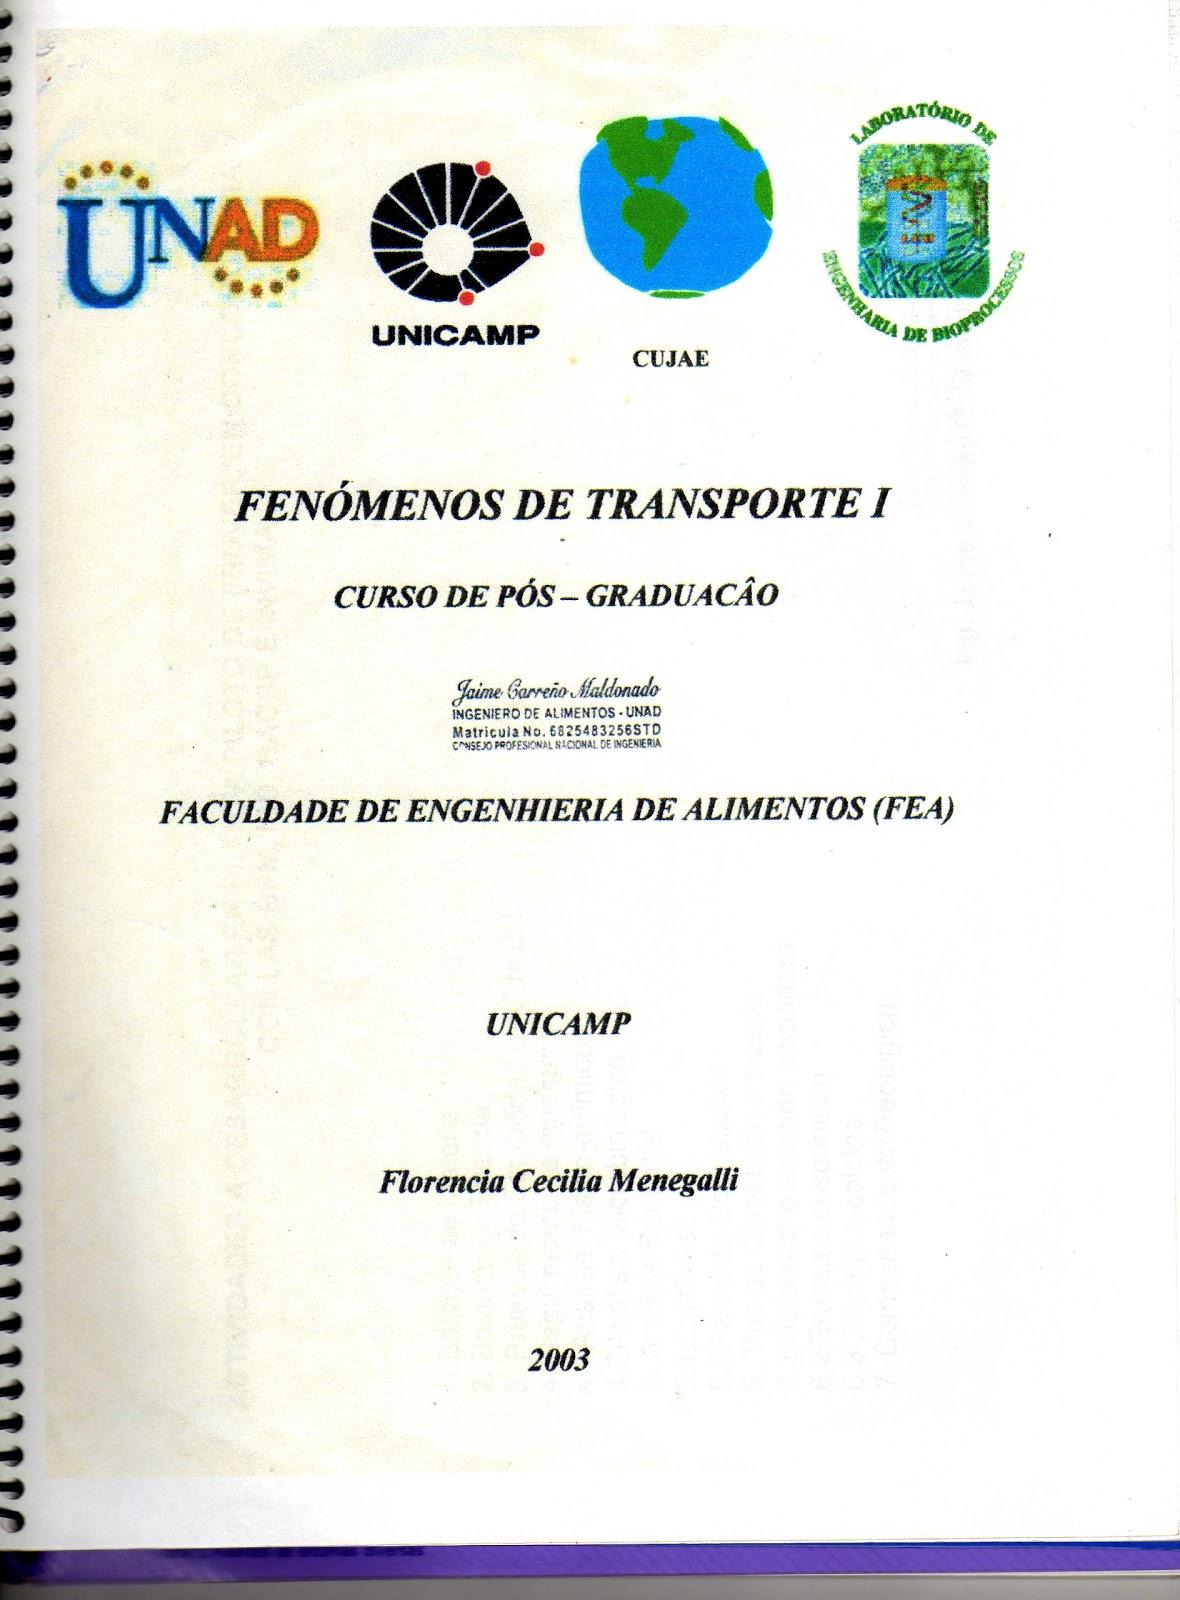 investigaciones de transporte: